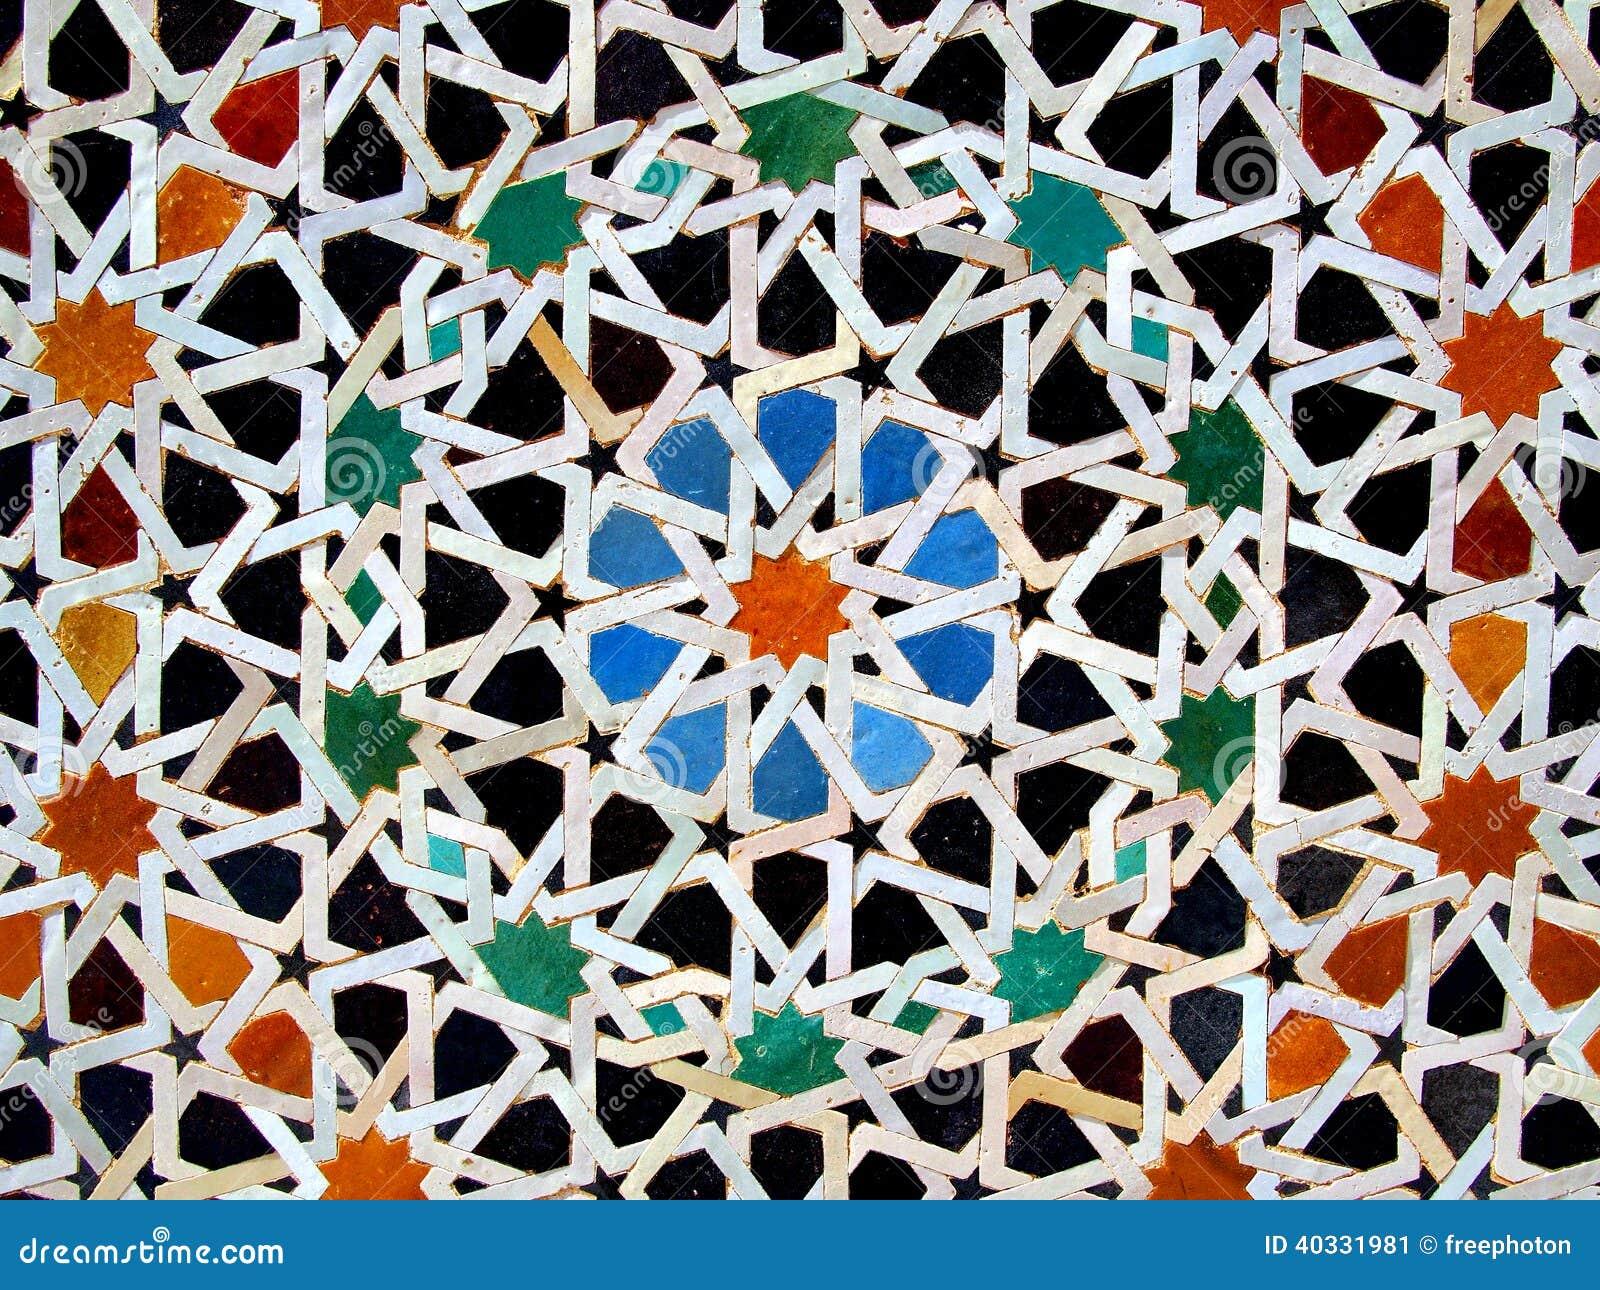 zellige tuiles de mosa que marocaines image stock image du mosa que principal 40331981. Black Bedroom Furniture Sets. Home Design Ideas